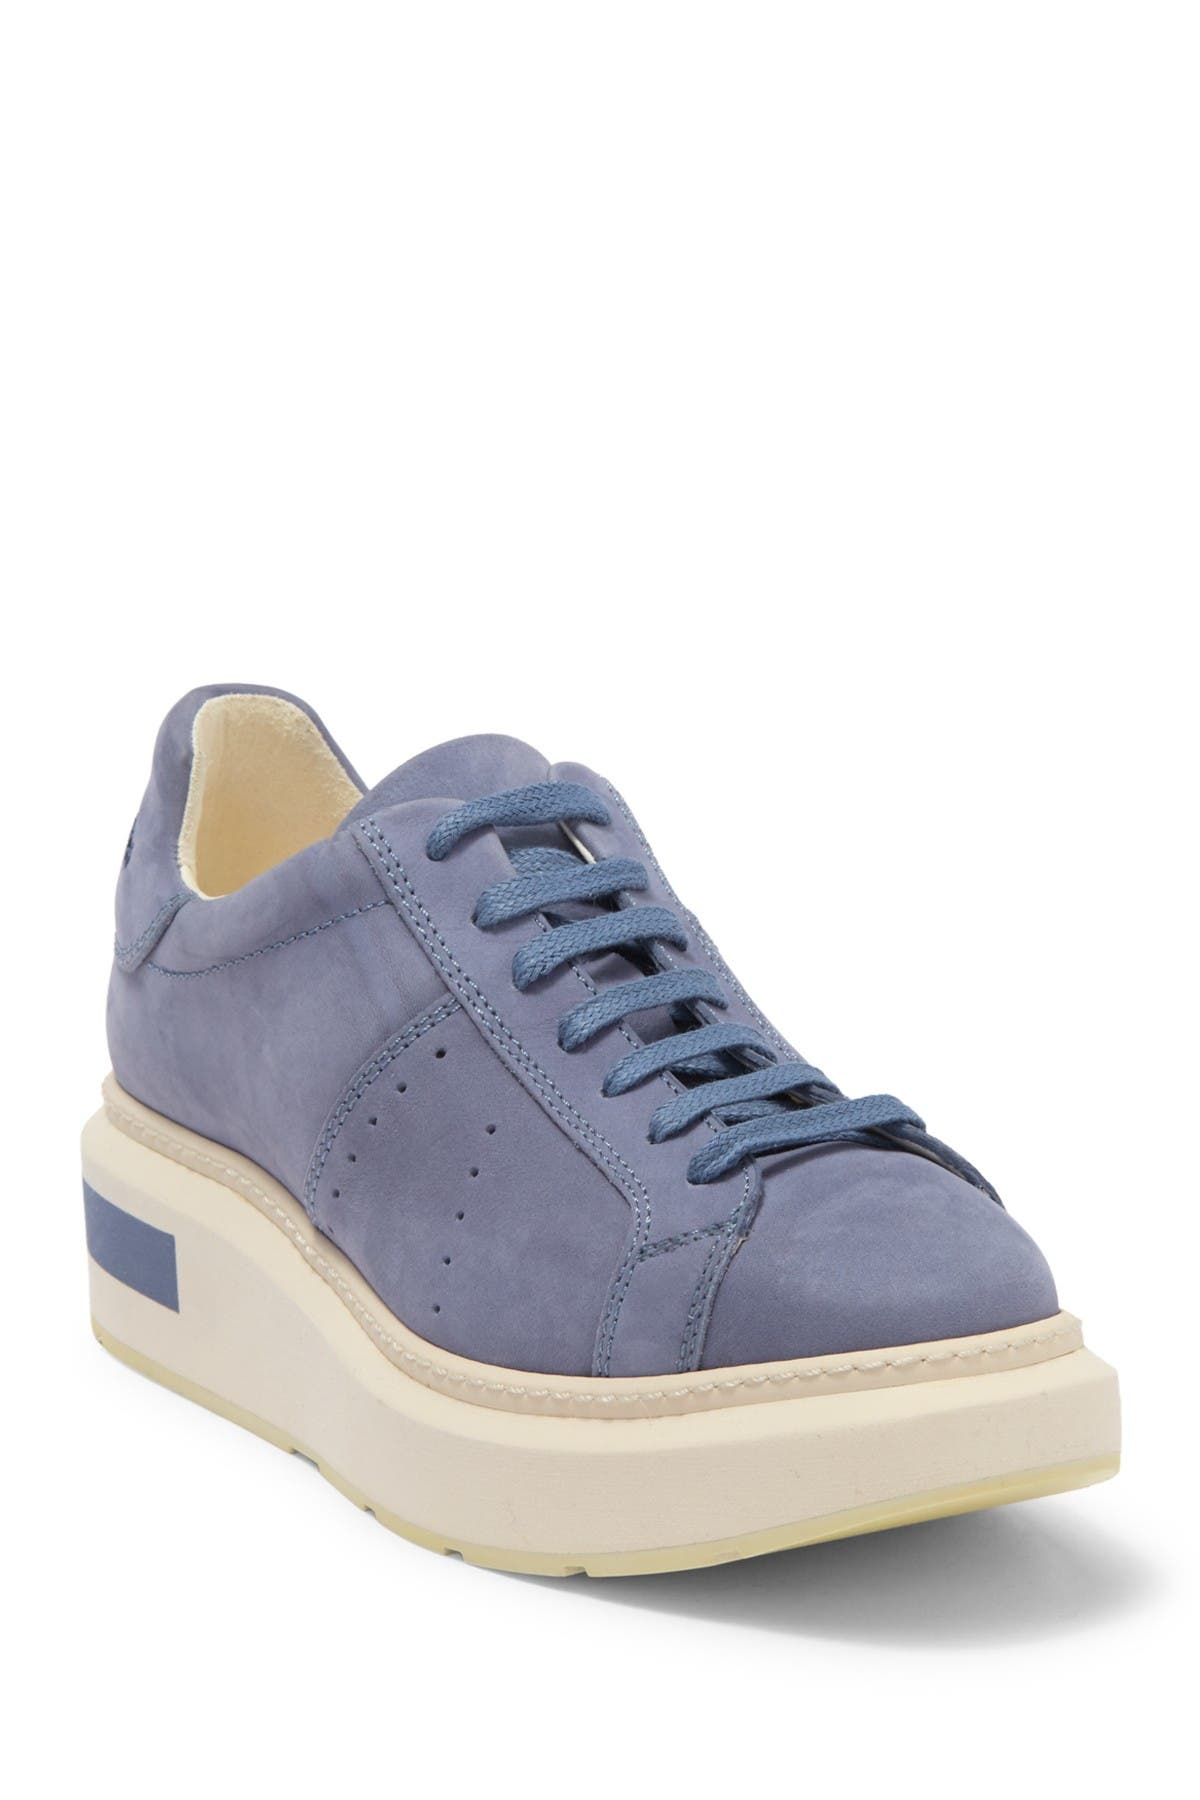 Image of Paloma Barcelo Etna Platform Sneaker